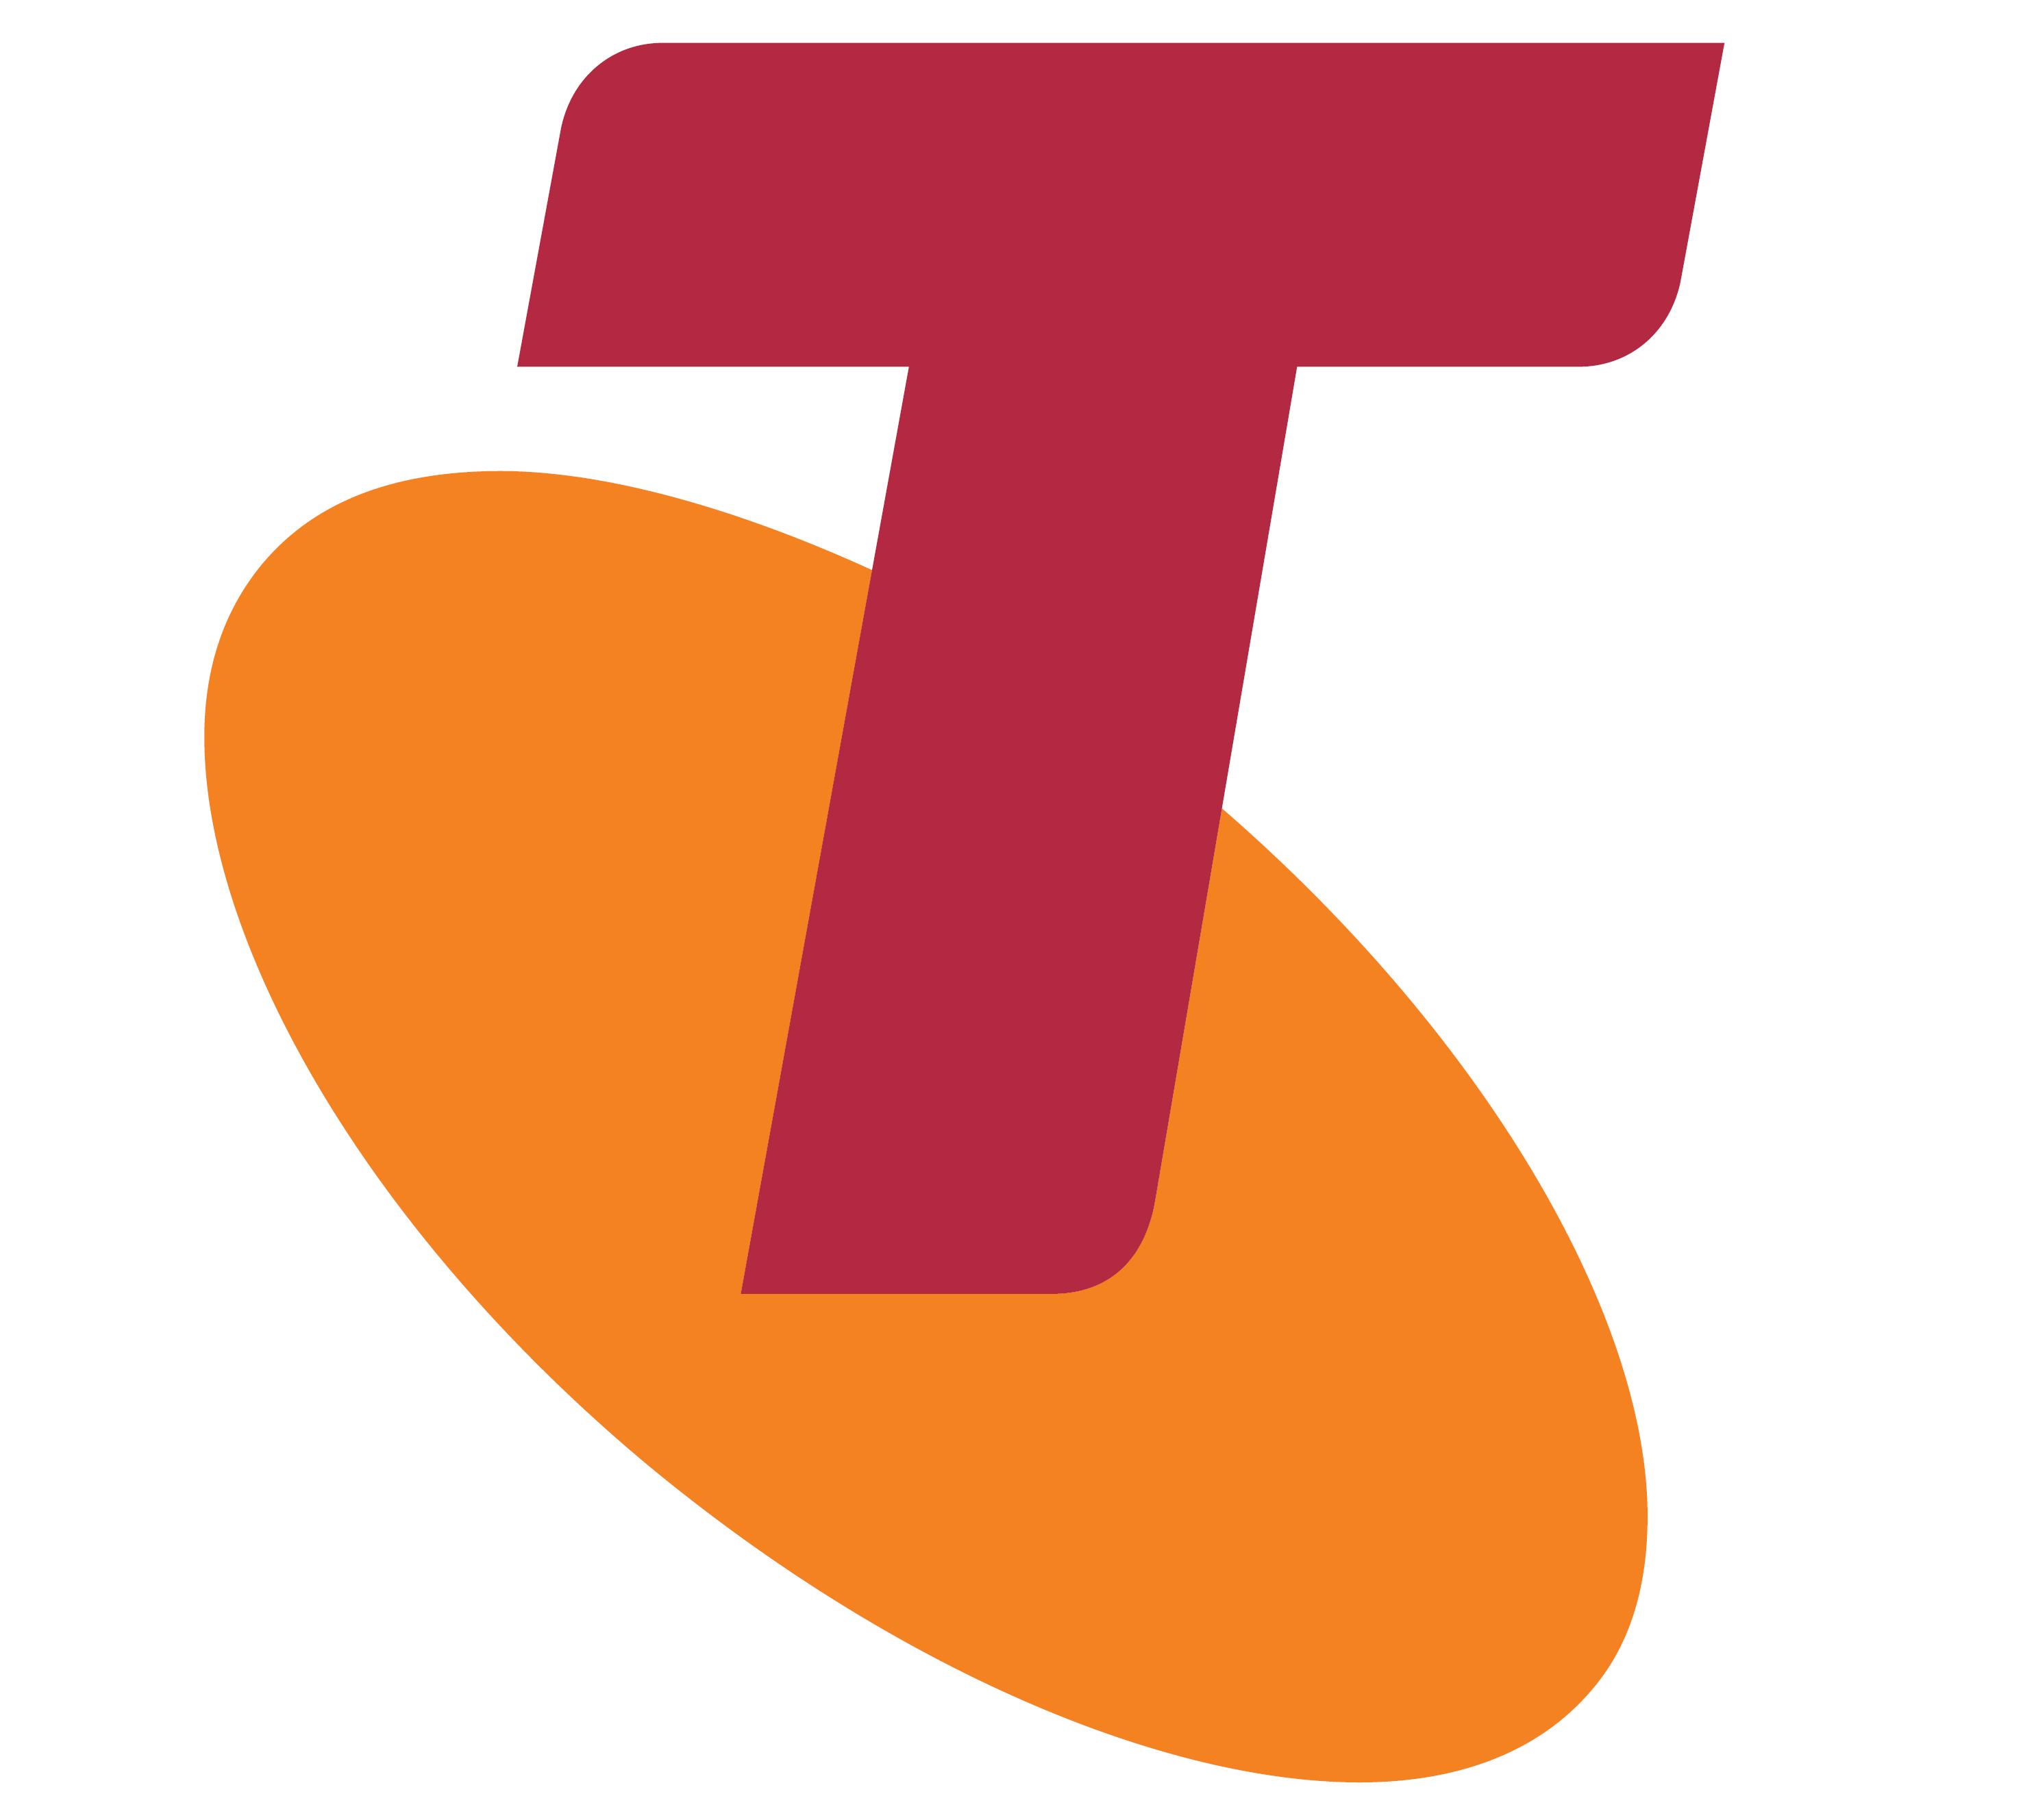 Telstra